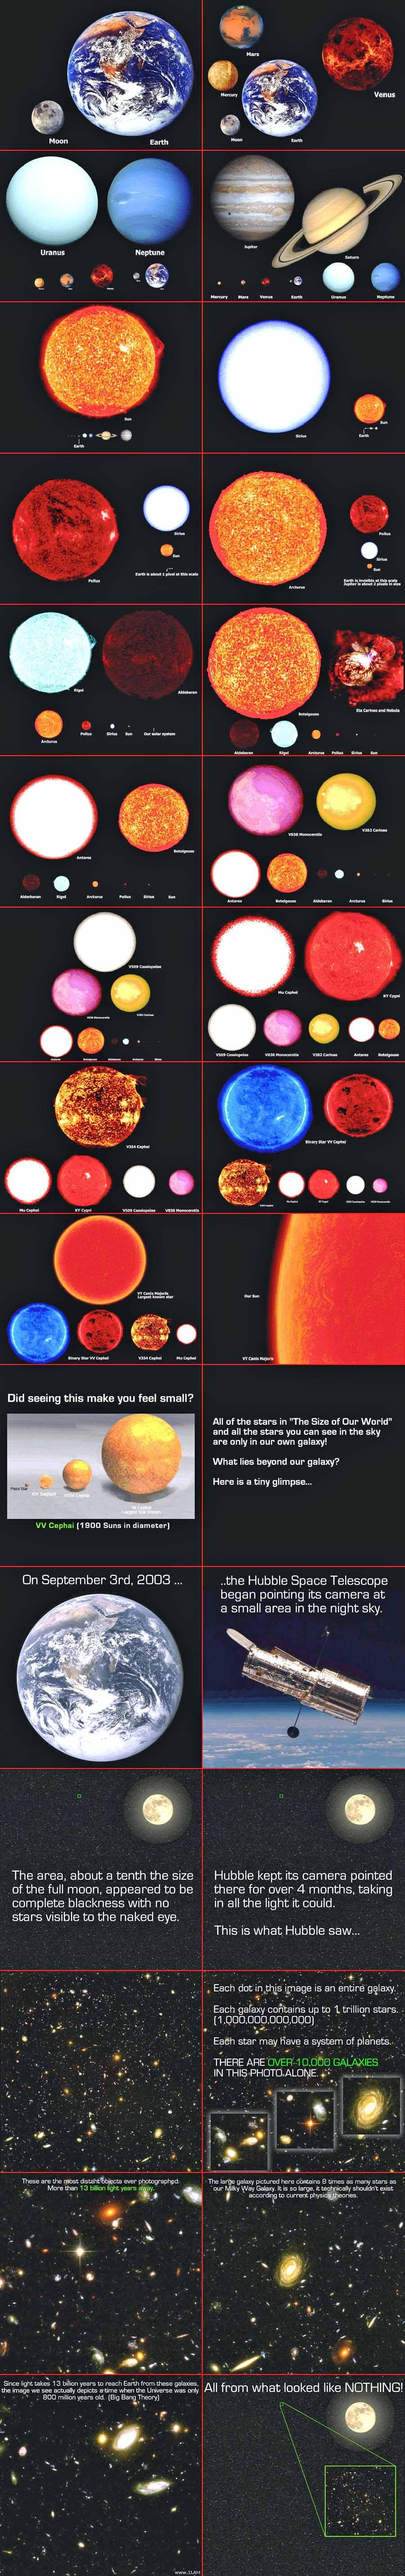 Earth, planets, stars, galaxies...